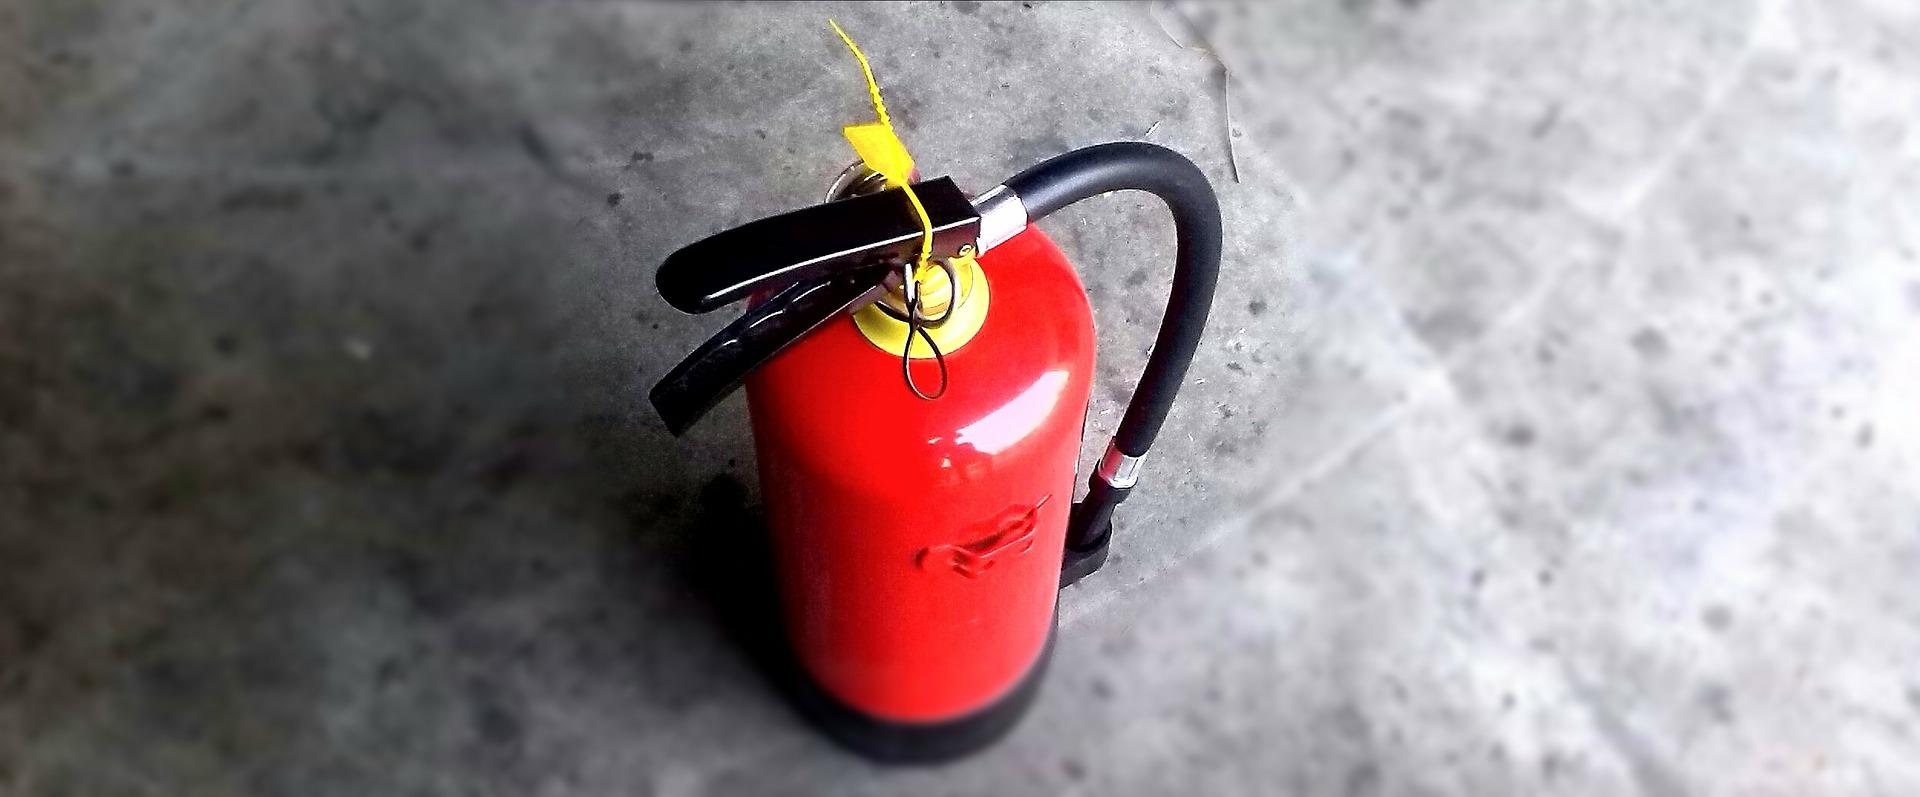 Extintores Cano en sevilla